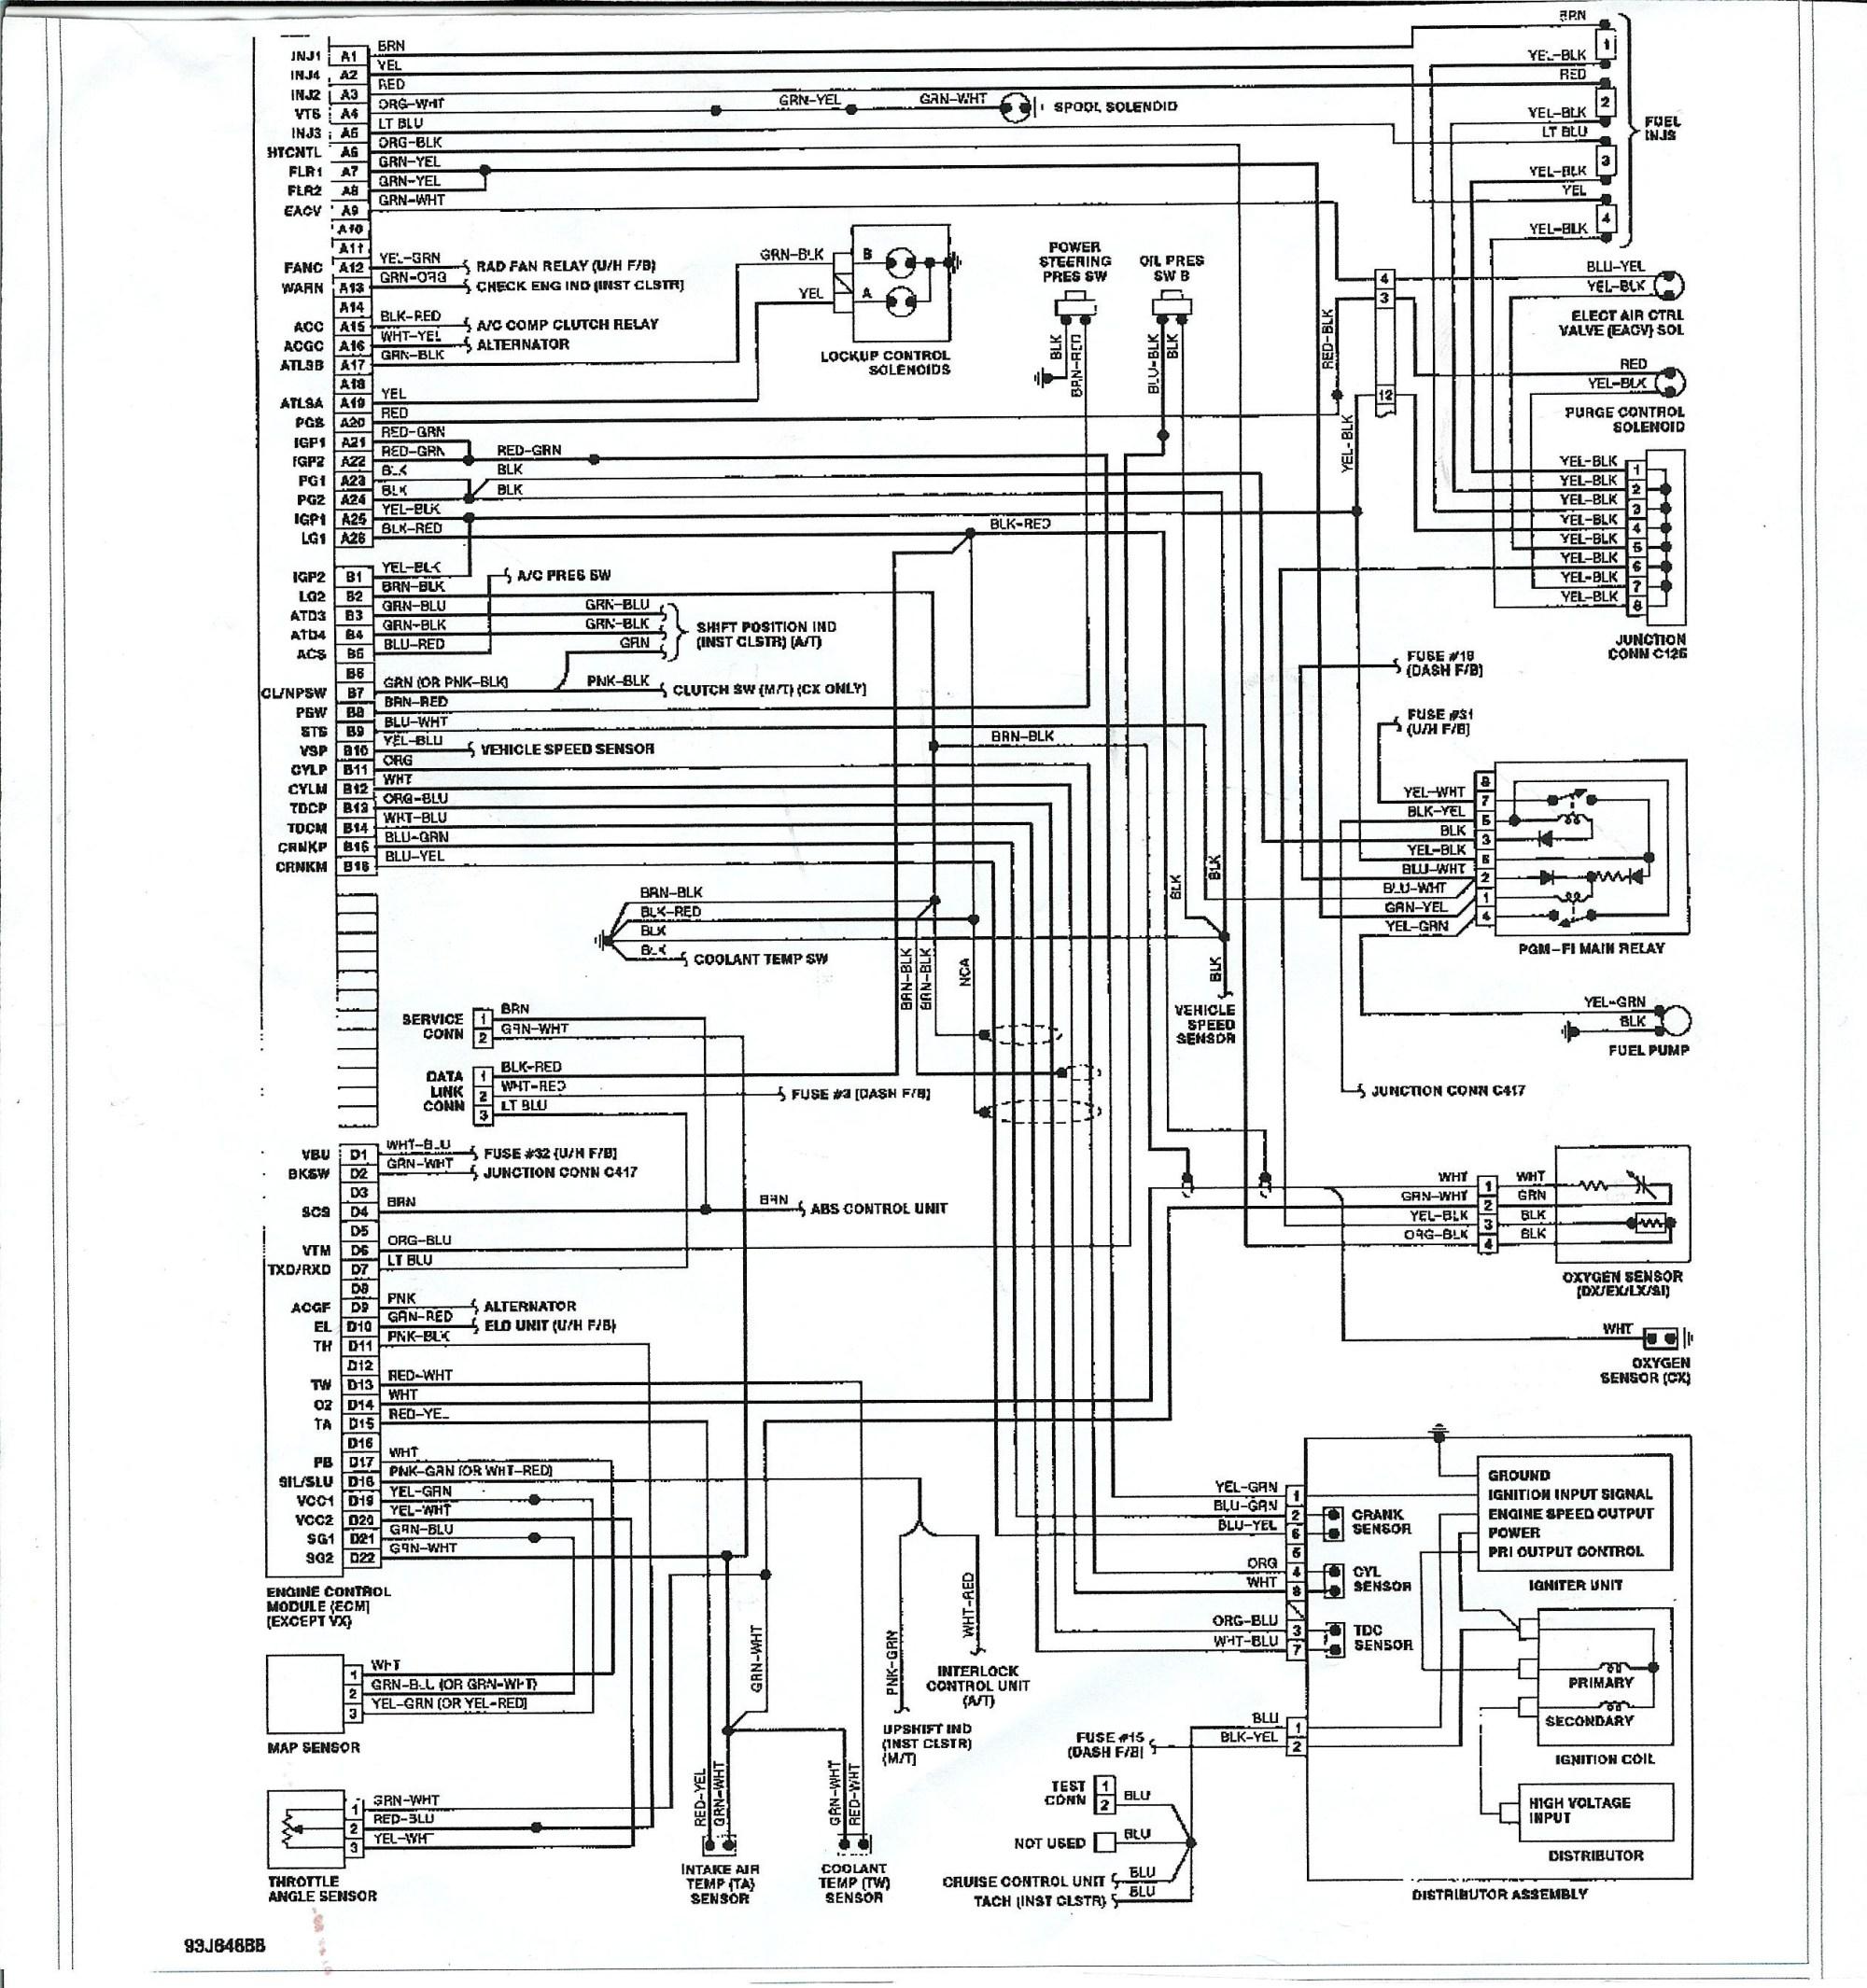 hight resolution of 99 honda accord engine diagram vw transporter wiring diagram 95 honda civic transmission diagram of 99